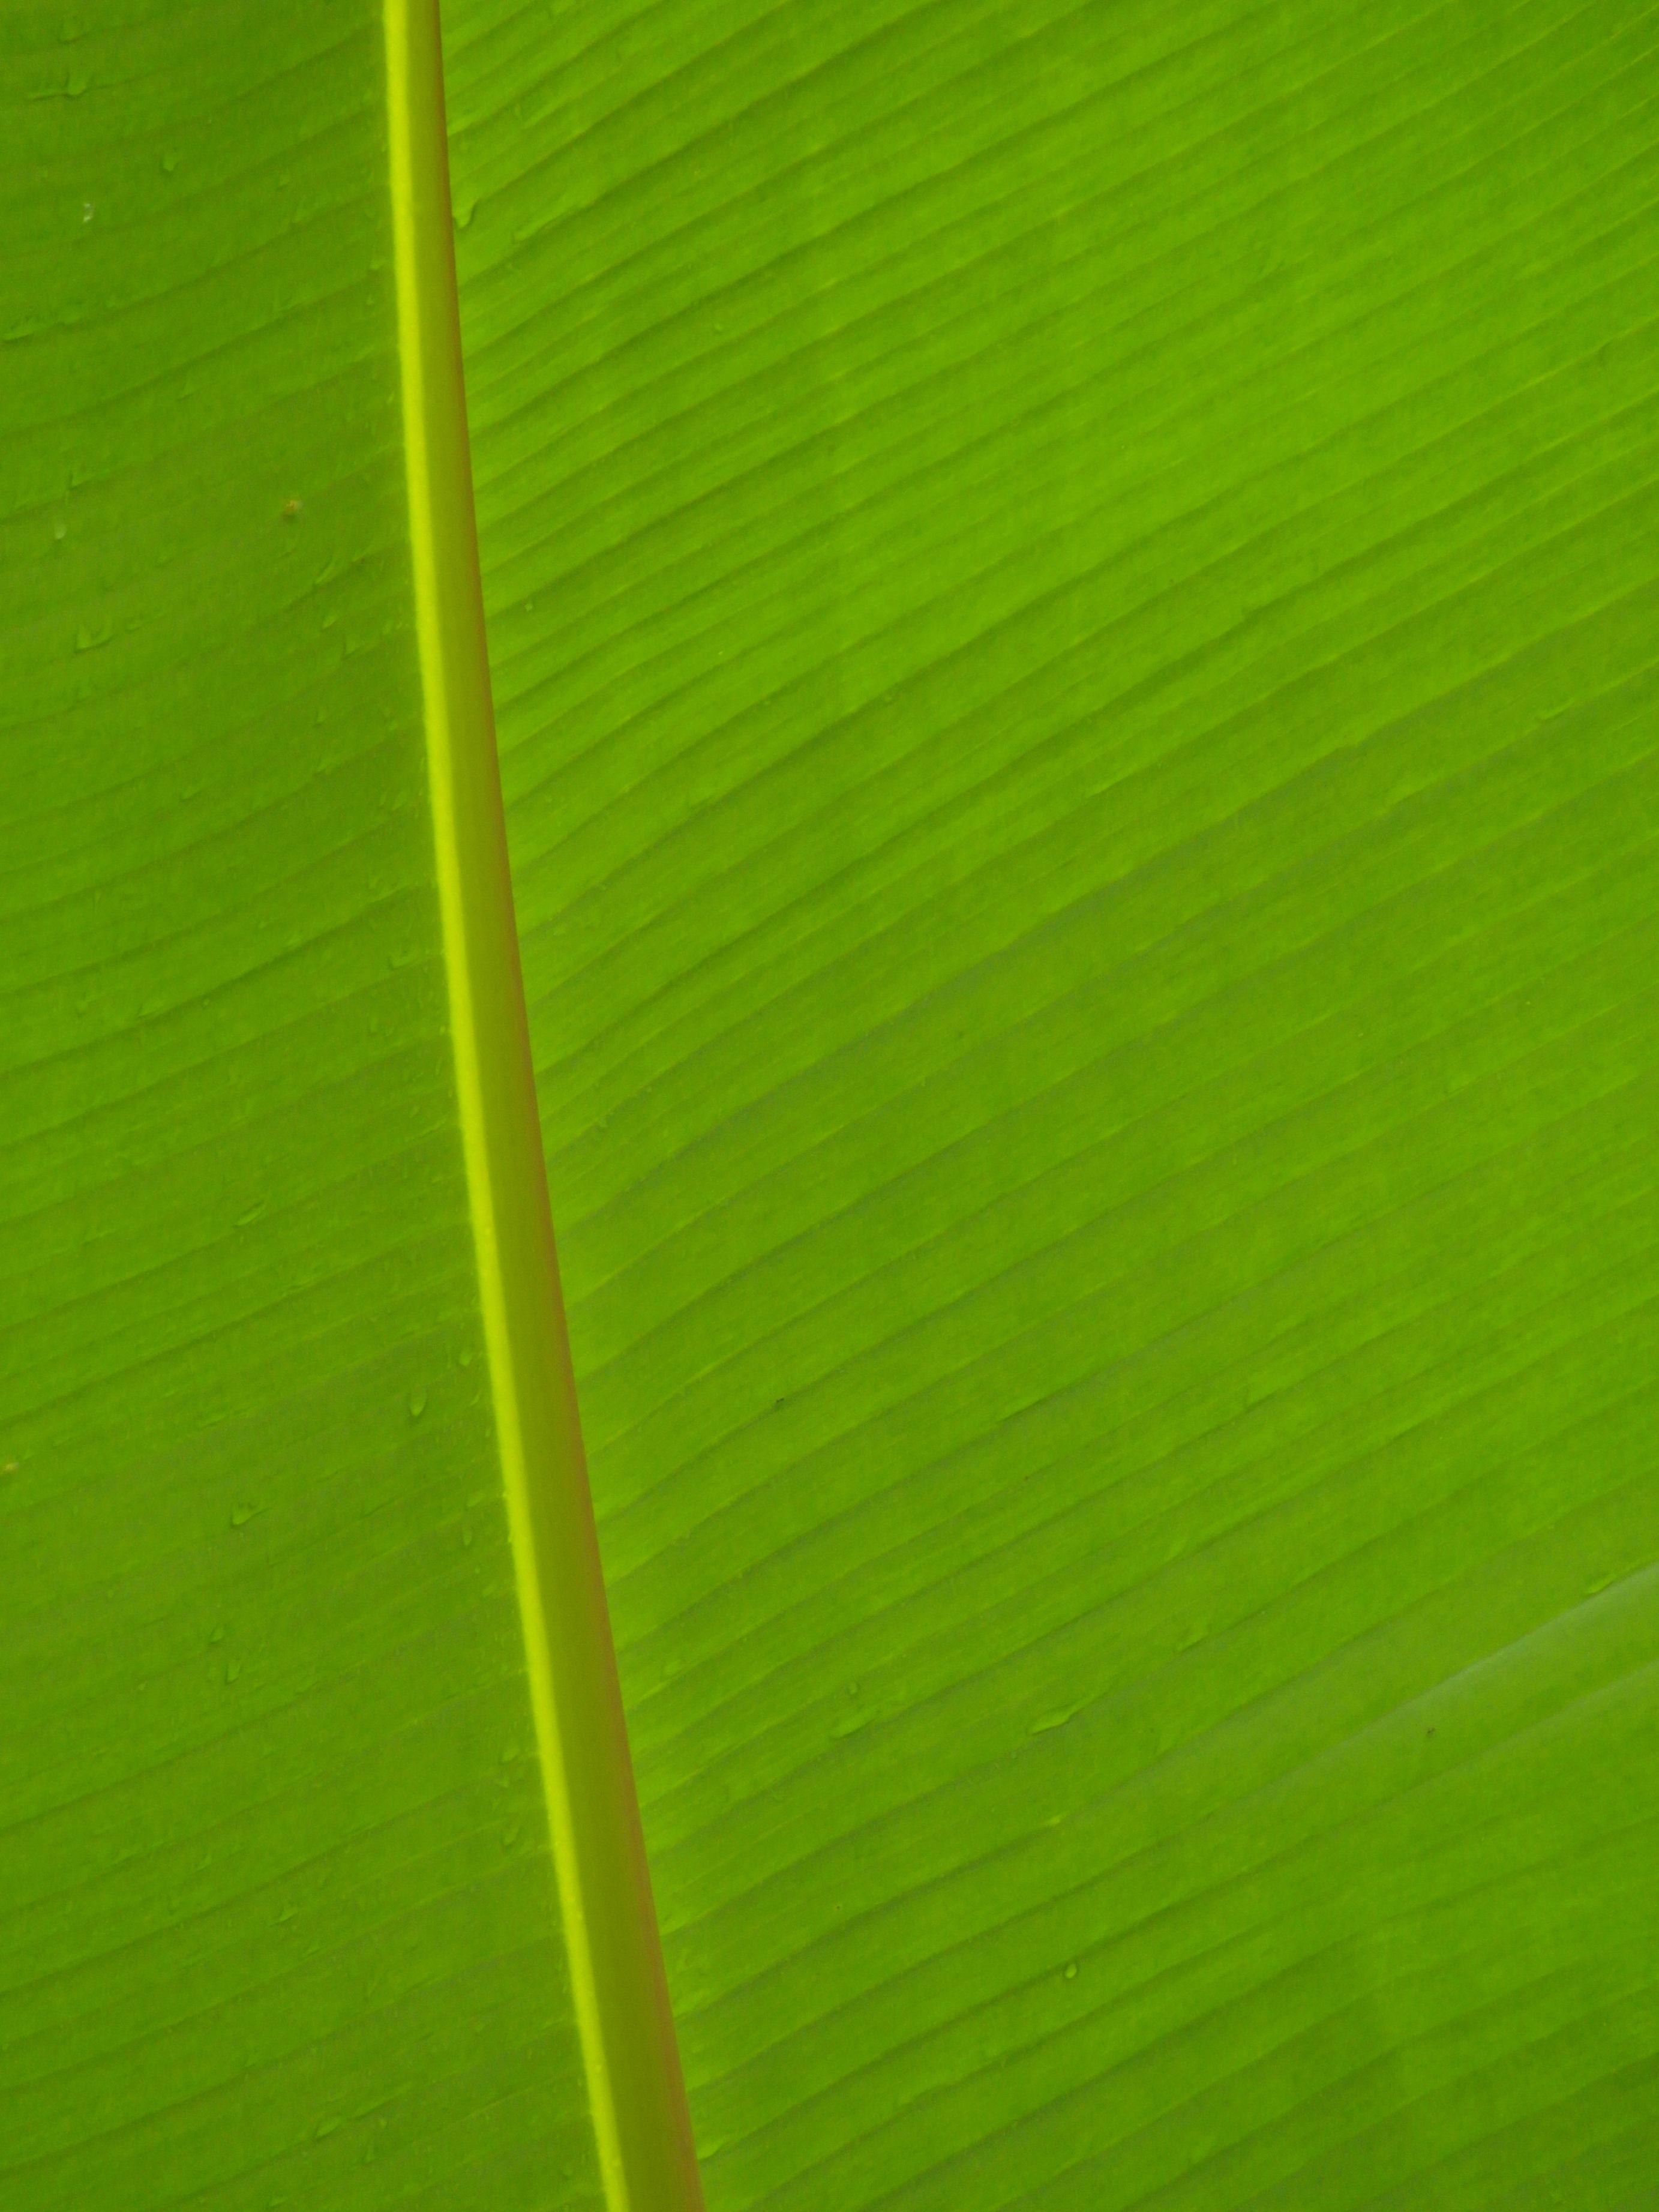 Banana Leaf Background, Abstract, Leaf, Life, Light, HQ Photo